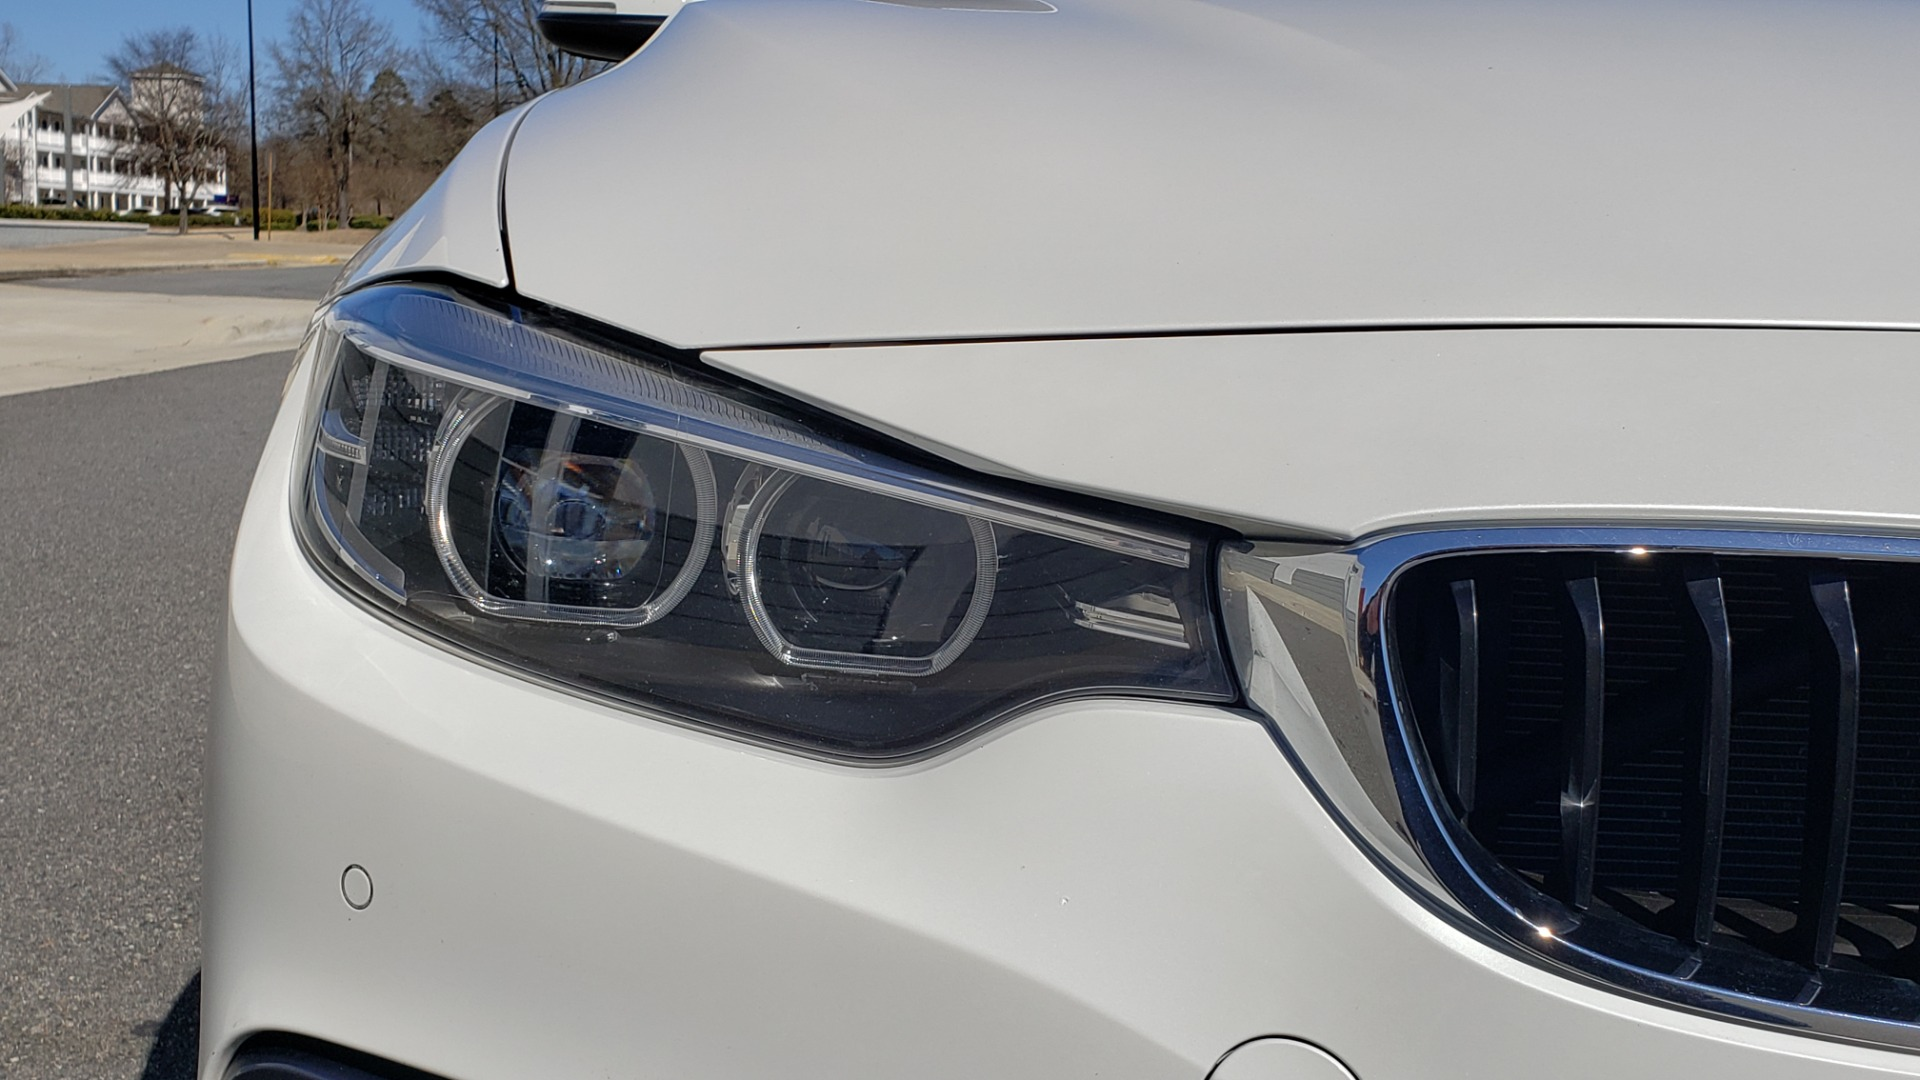 Used 2018 BMW 4 SERIES 430IXDRIVE / PREMIUM / NAV / SUNROOF / ESSENTIALS PKG for sale $28,995 at Formula Imports in Charlotte NC 28227 28